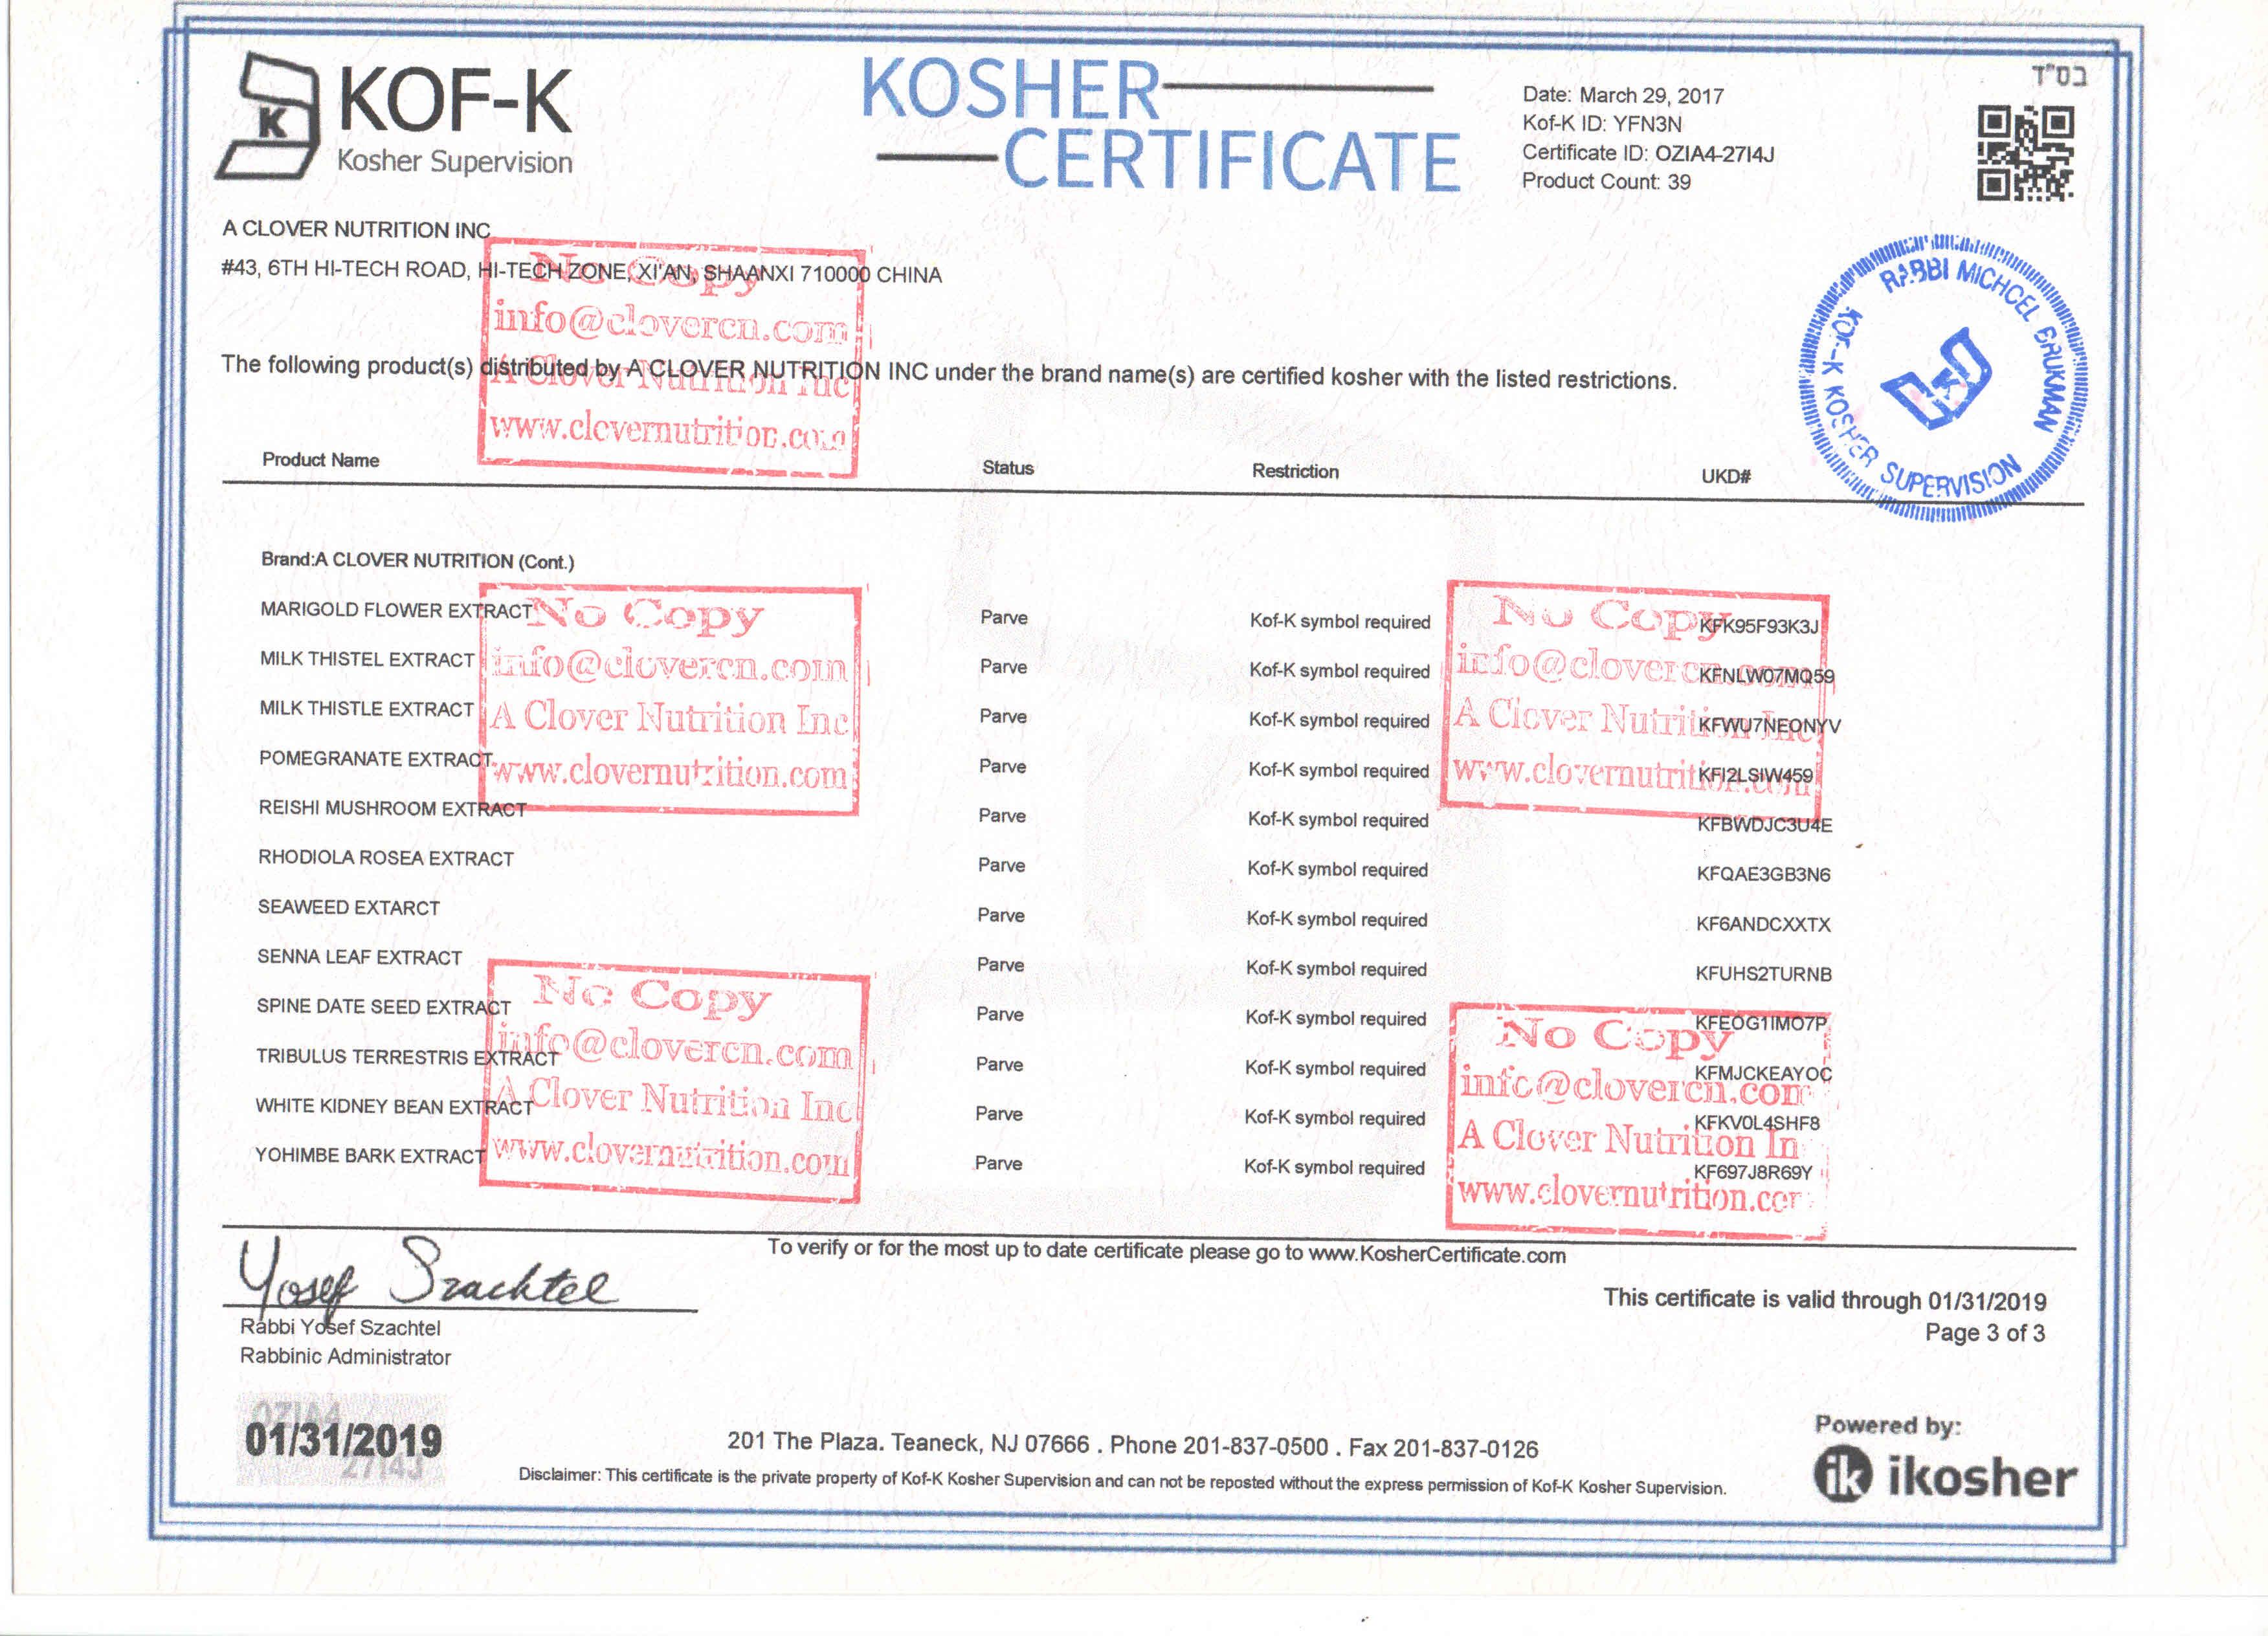 Kosher A Clover Nutrition Inc